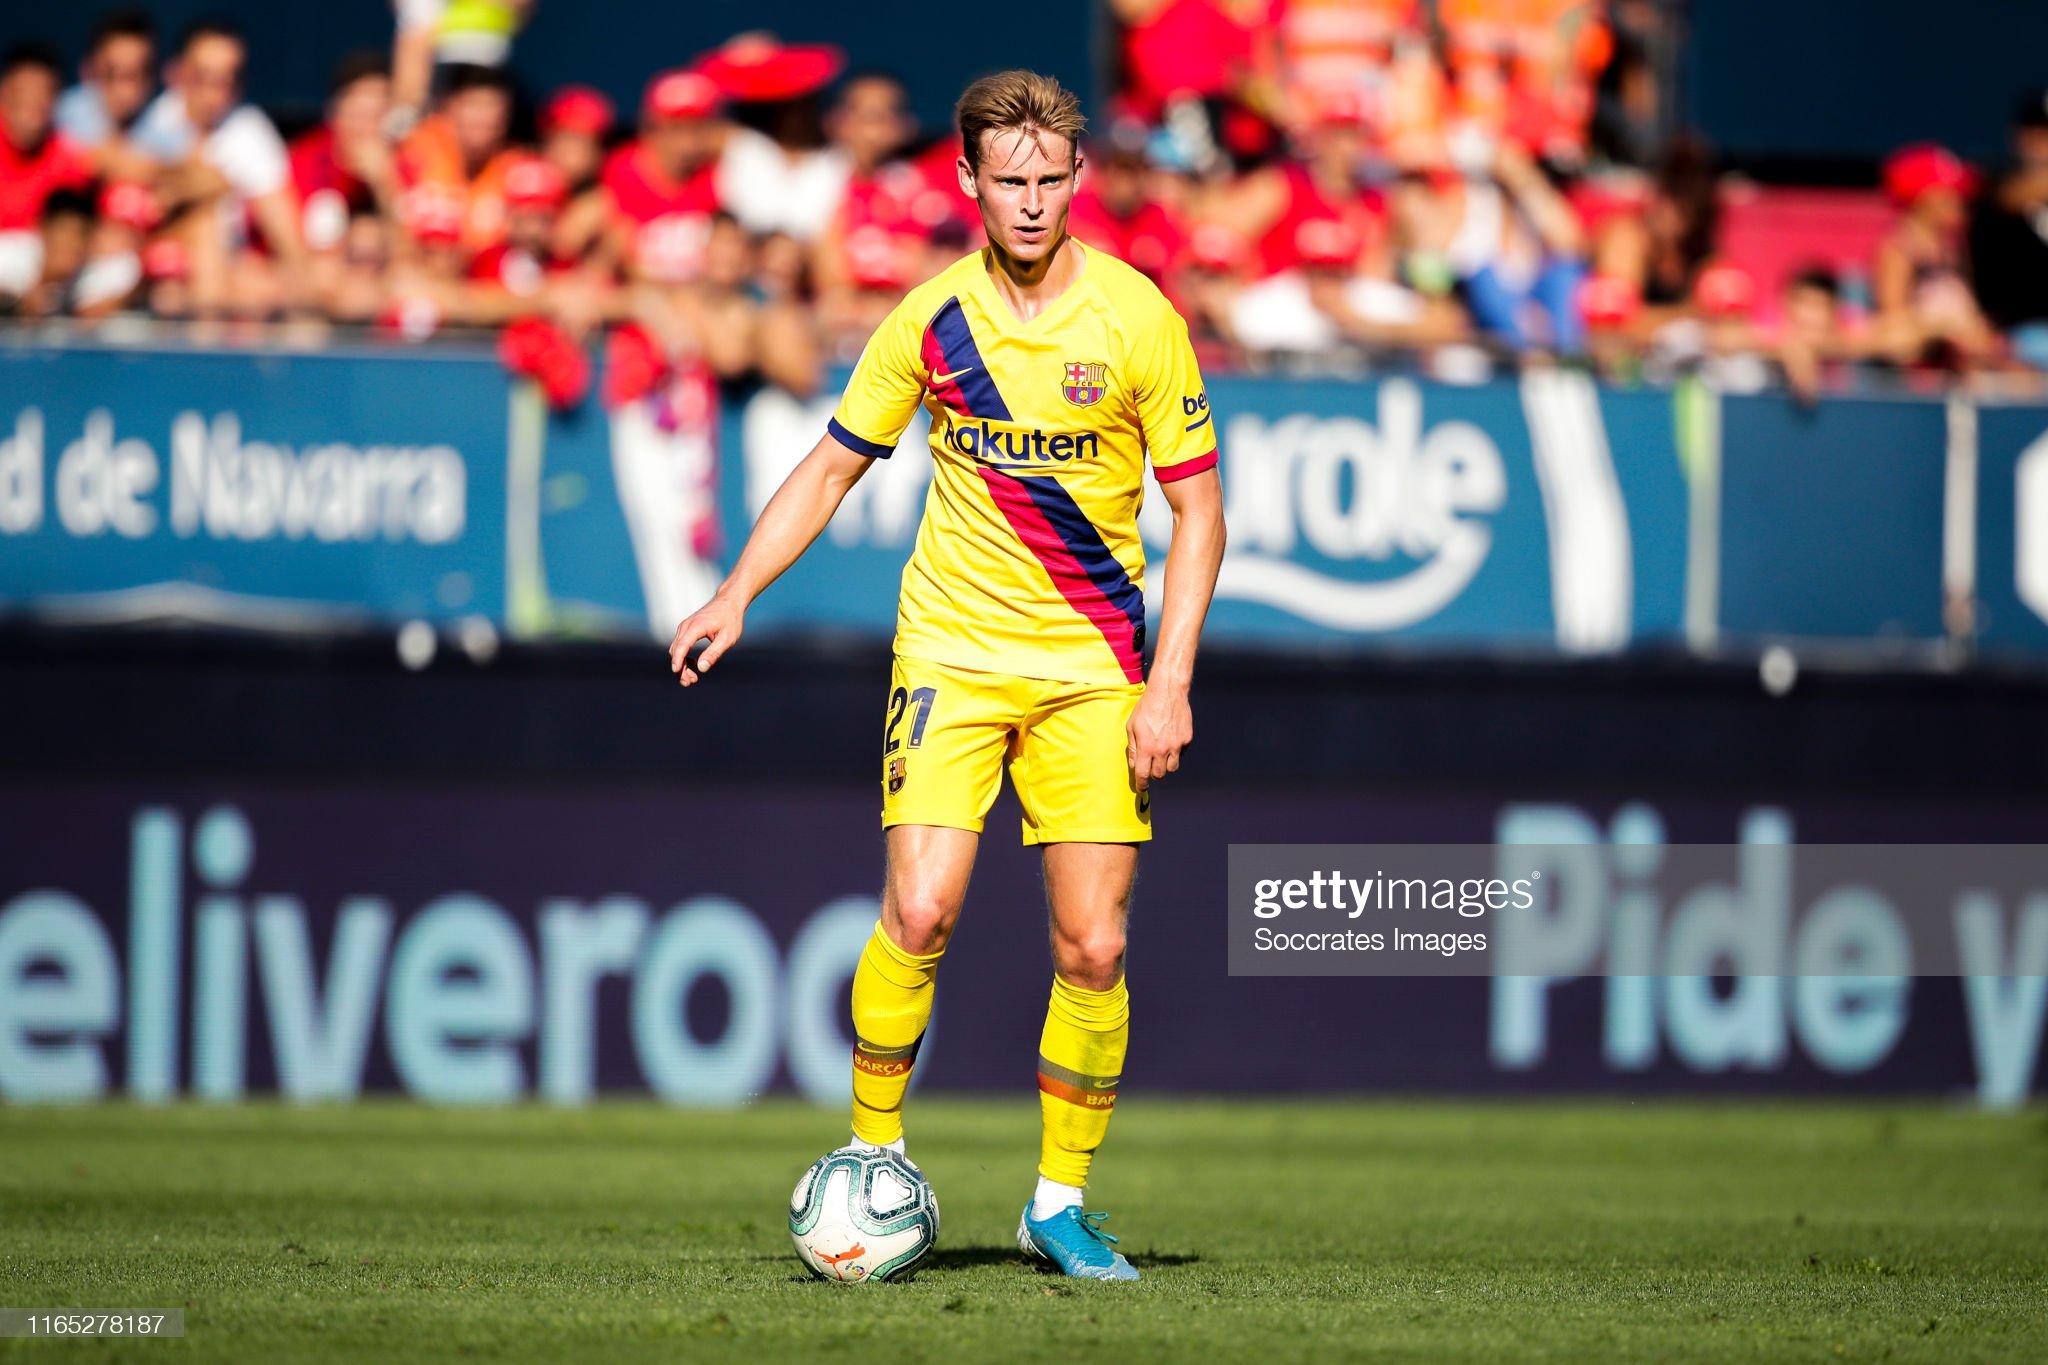 صور مباراة : أوساسونا - برشلونة 2-2 ( 31-08-2019 )  Frenkie-de-jong-of-fc-barcelona-during-the-la-liga-santander-match-picture-id1165278187?s=2048x2048